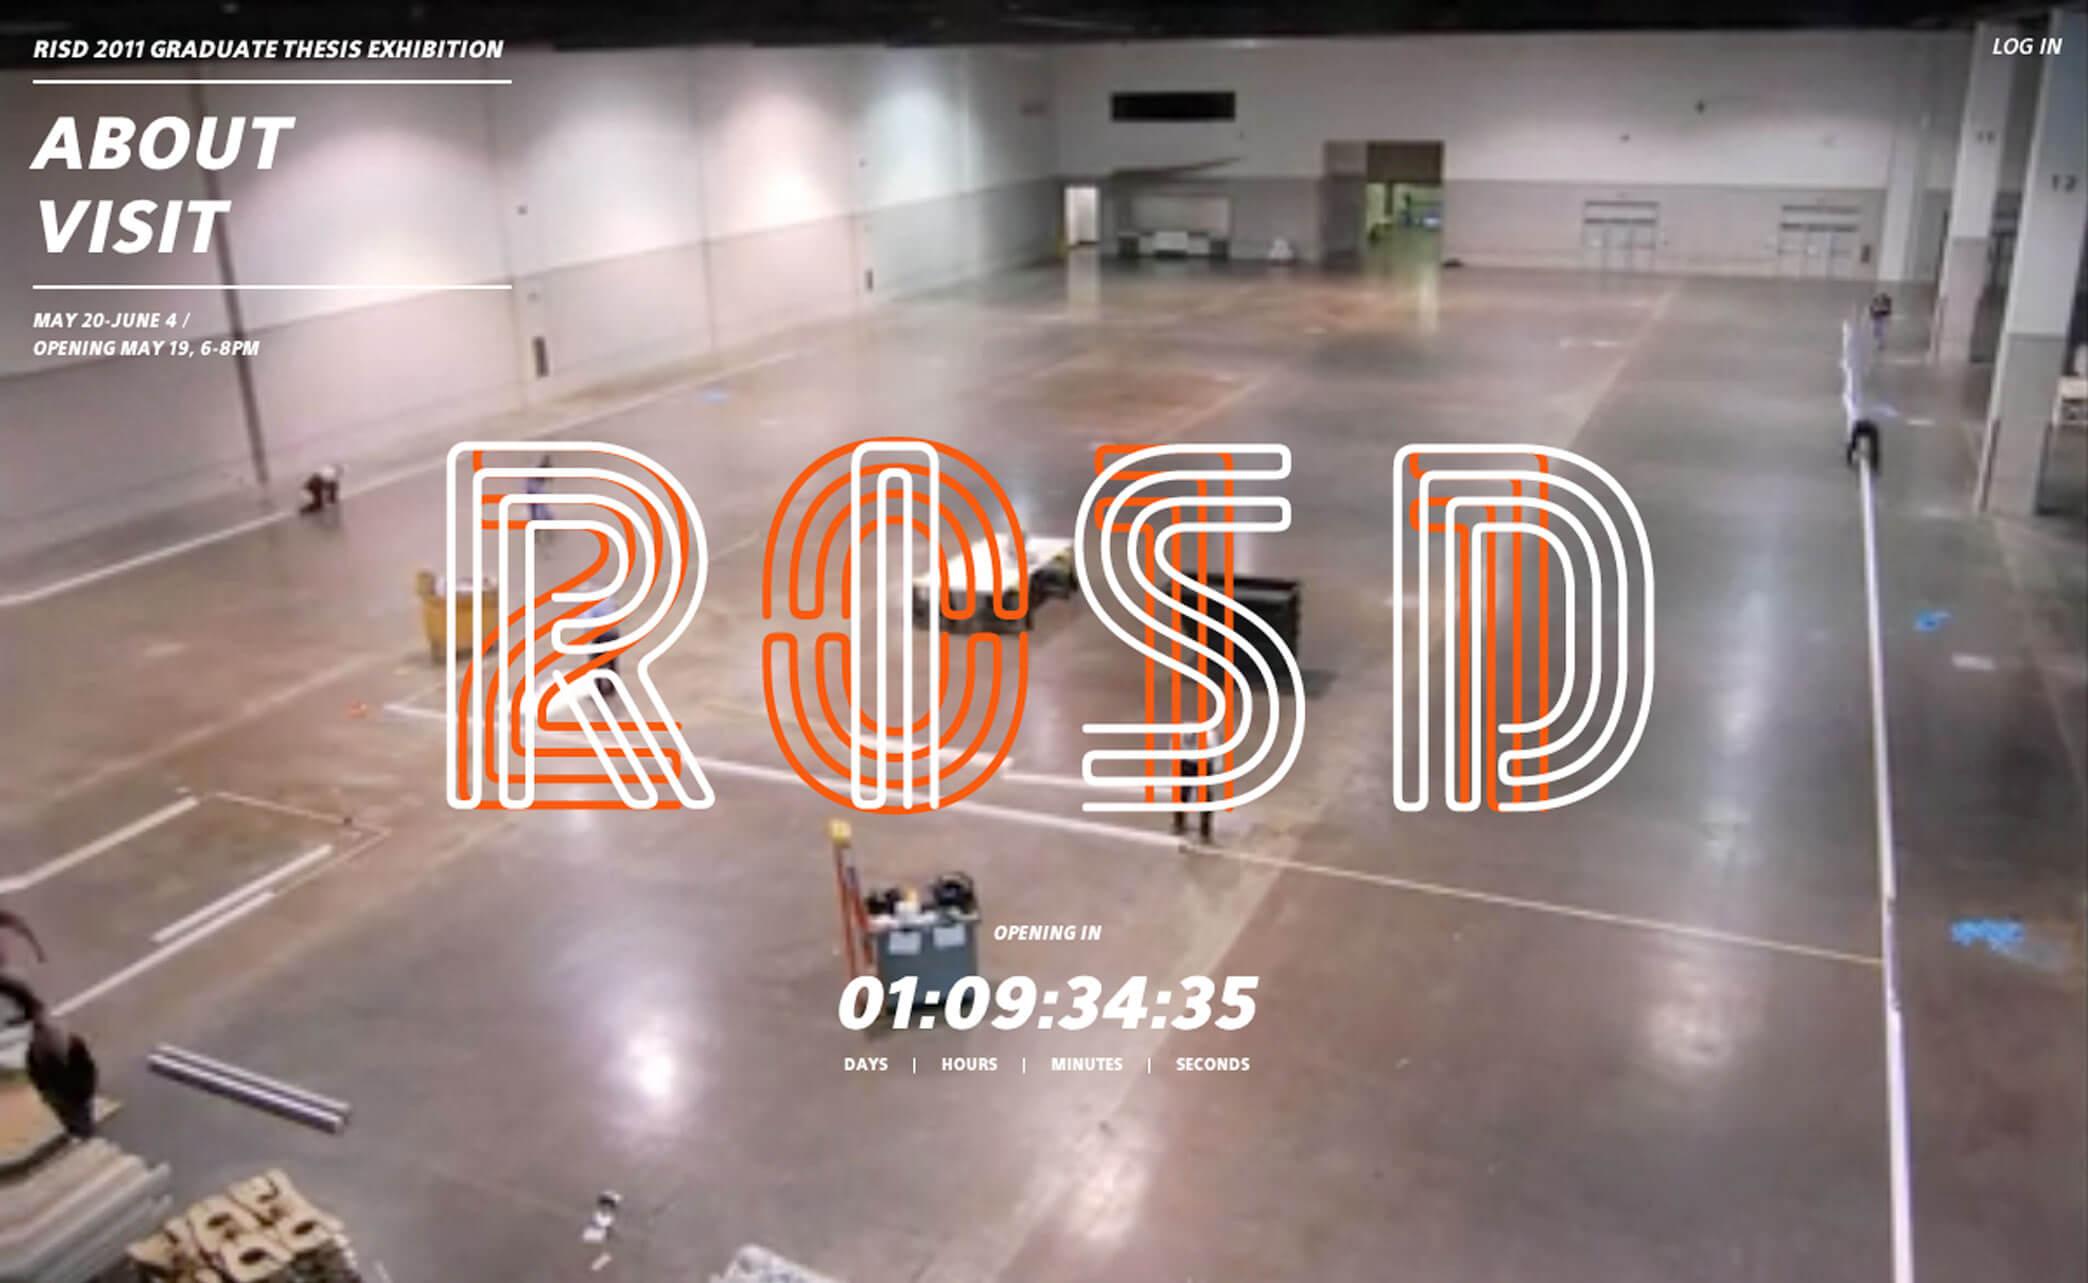 RISDThesisWeb_4e